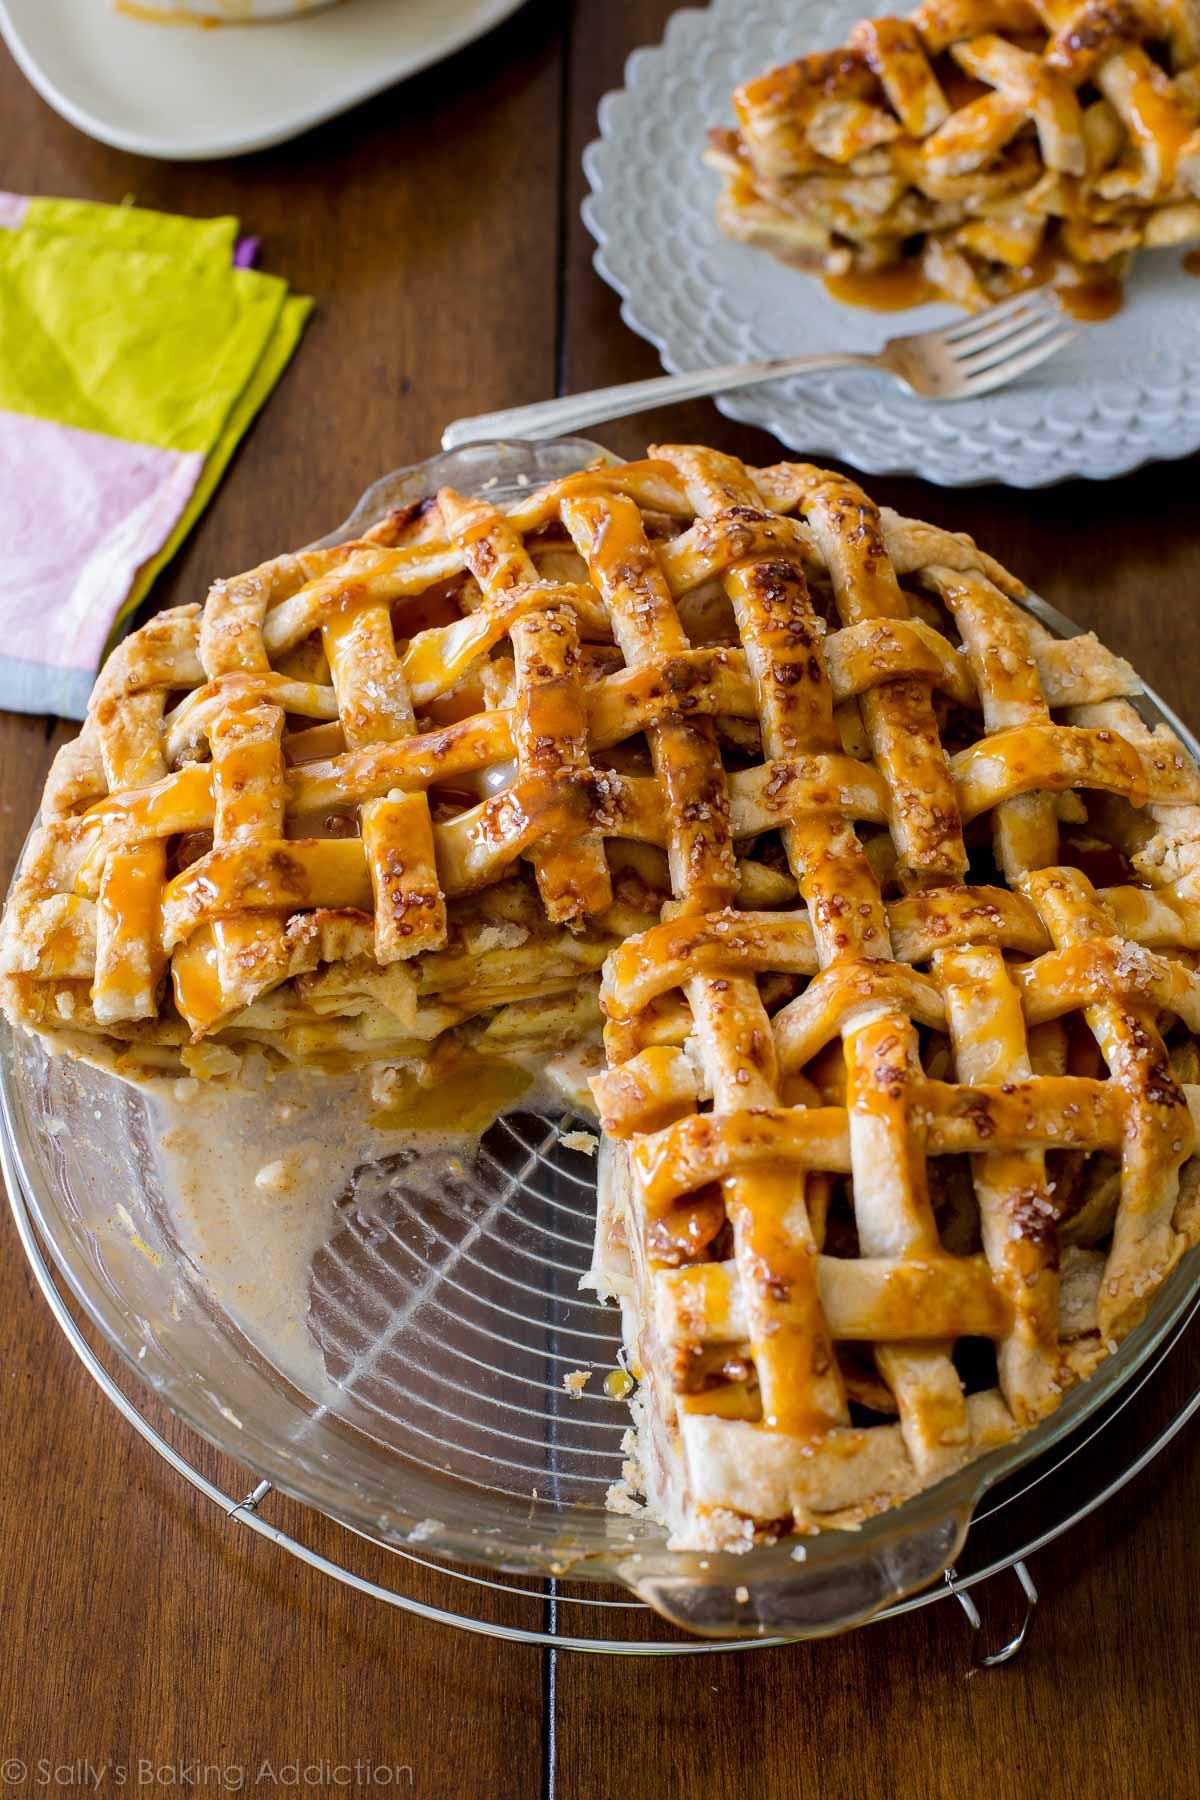 Recipes For Apple Pie  Deep Dish Apple Pie Sallys Baking Addiction